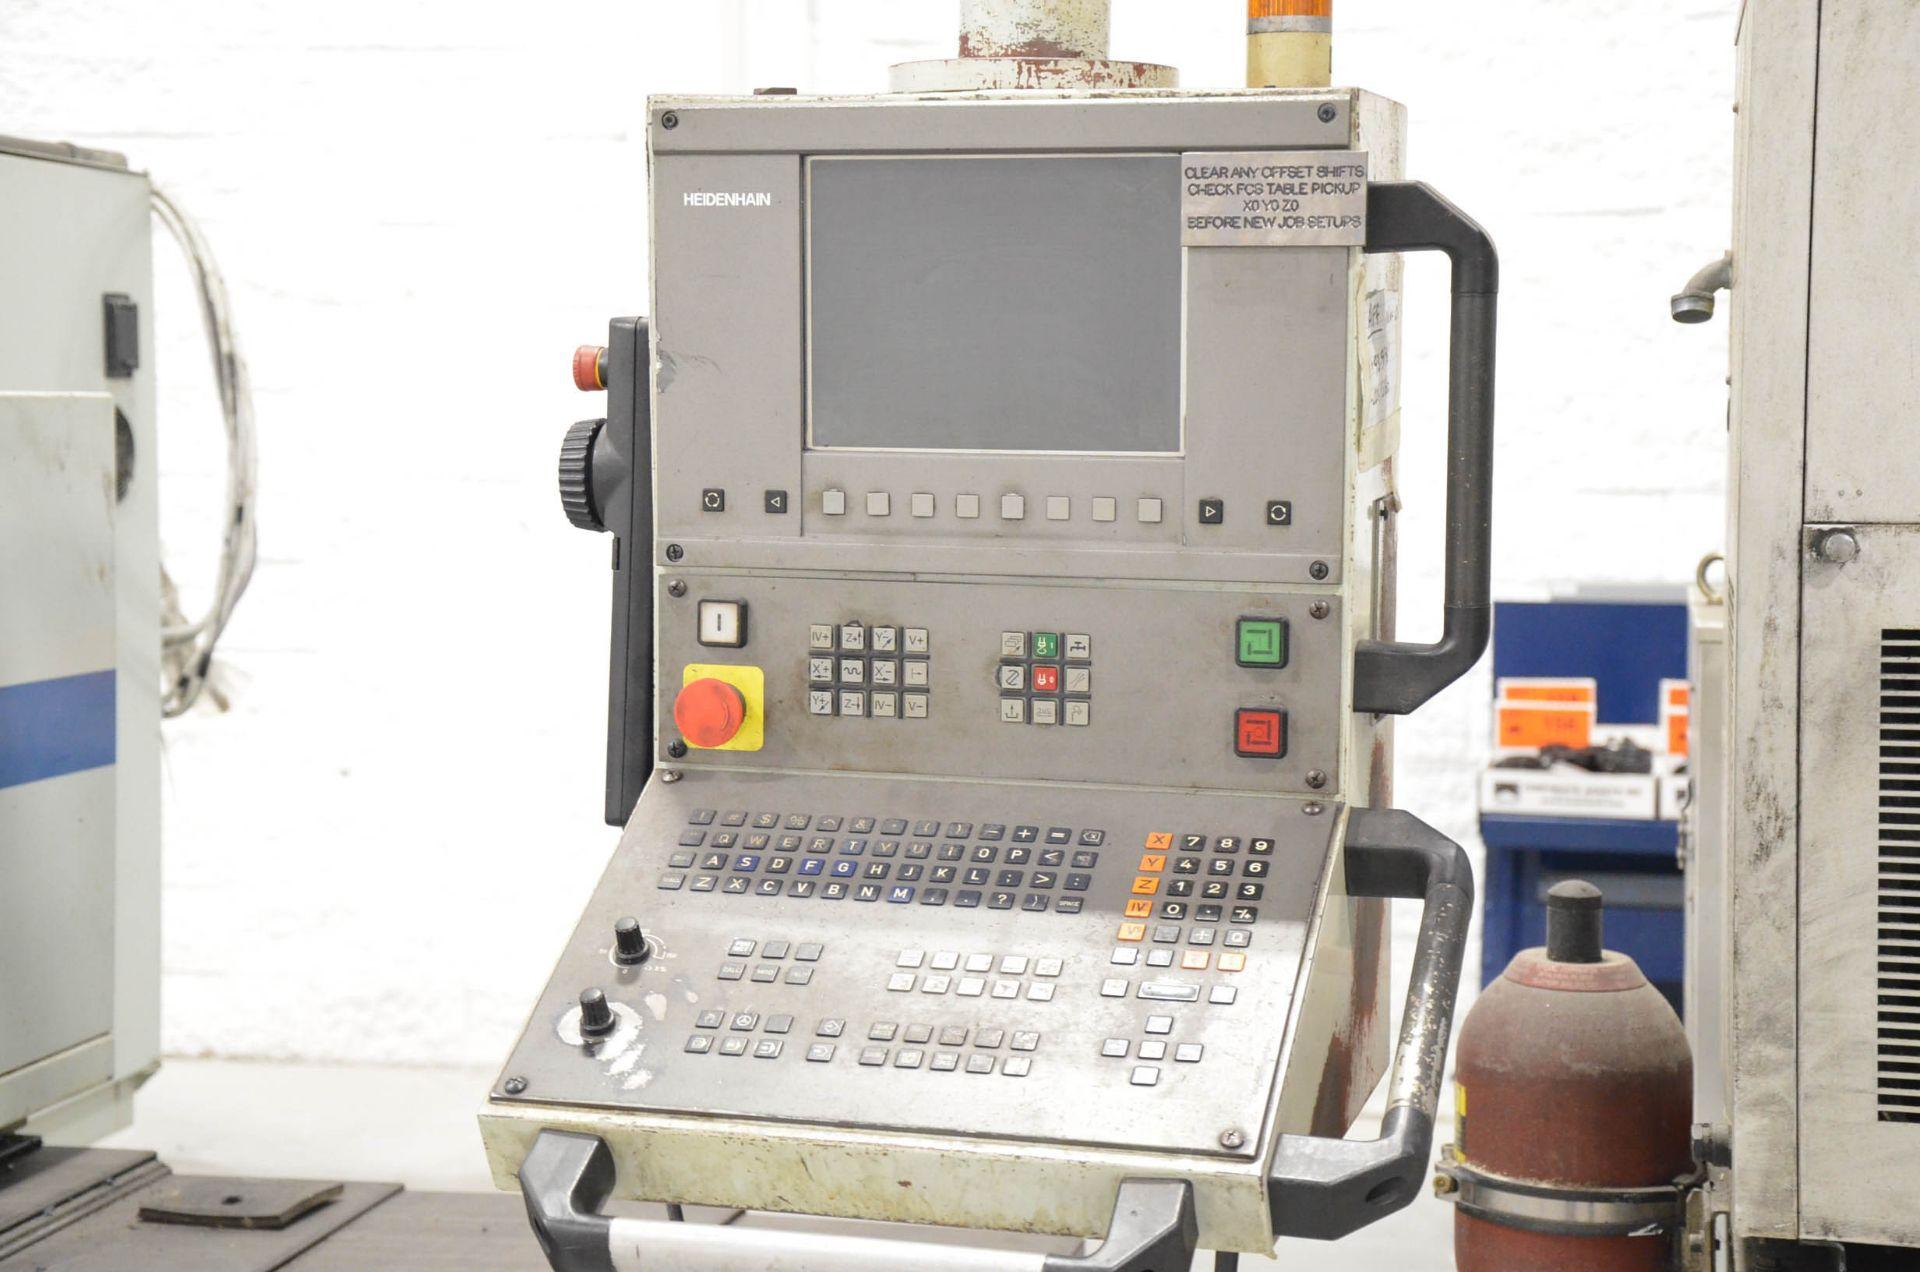 "PHOENIX KAFO (2001) VMC-21100 CNC VERTICAL MACHINING CENTER WITH HEIDENHAIN CNC CONTROL, 39""X94"" - Image 3 of 7"